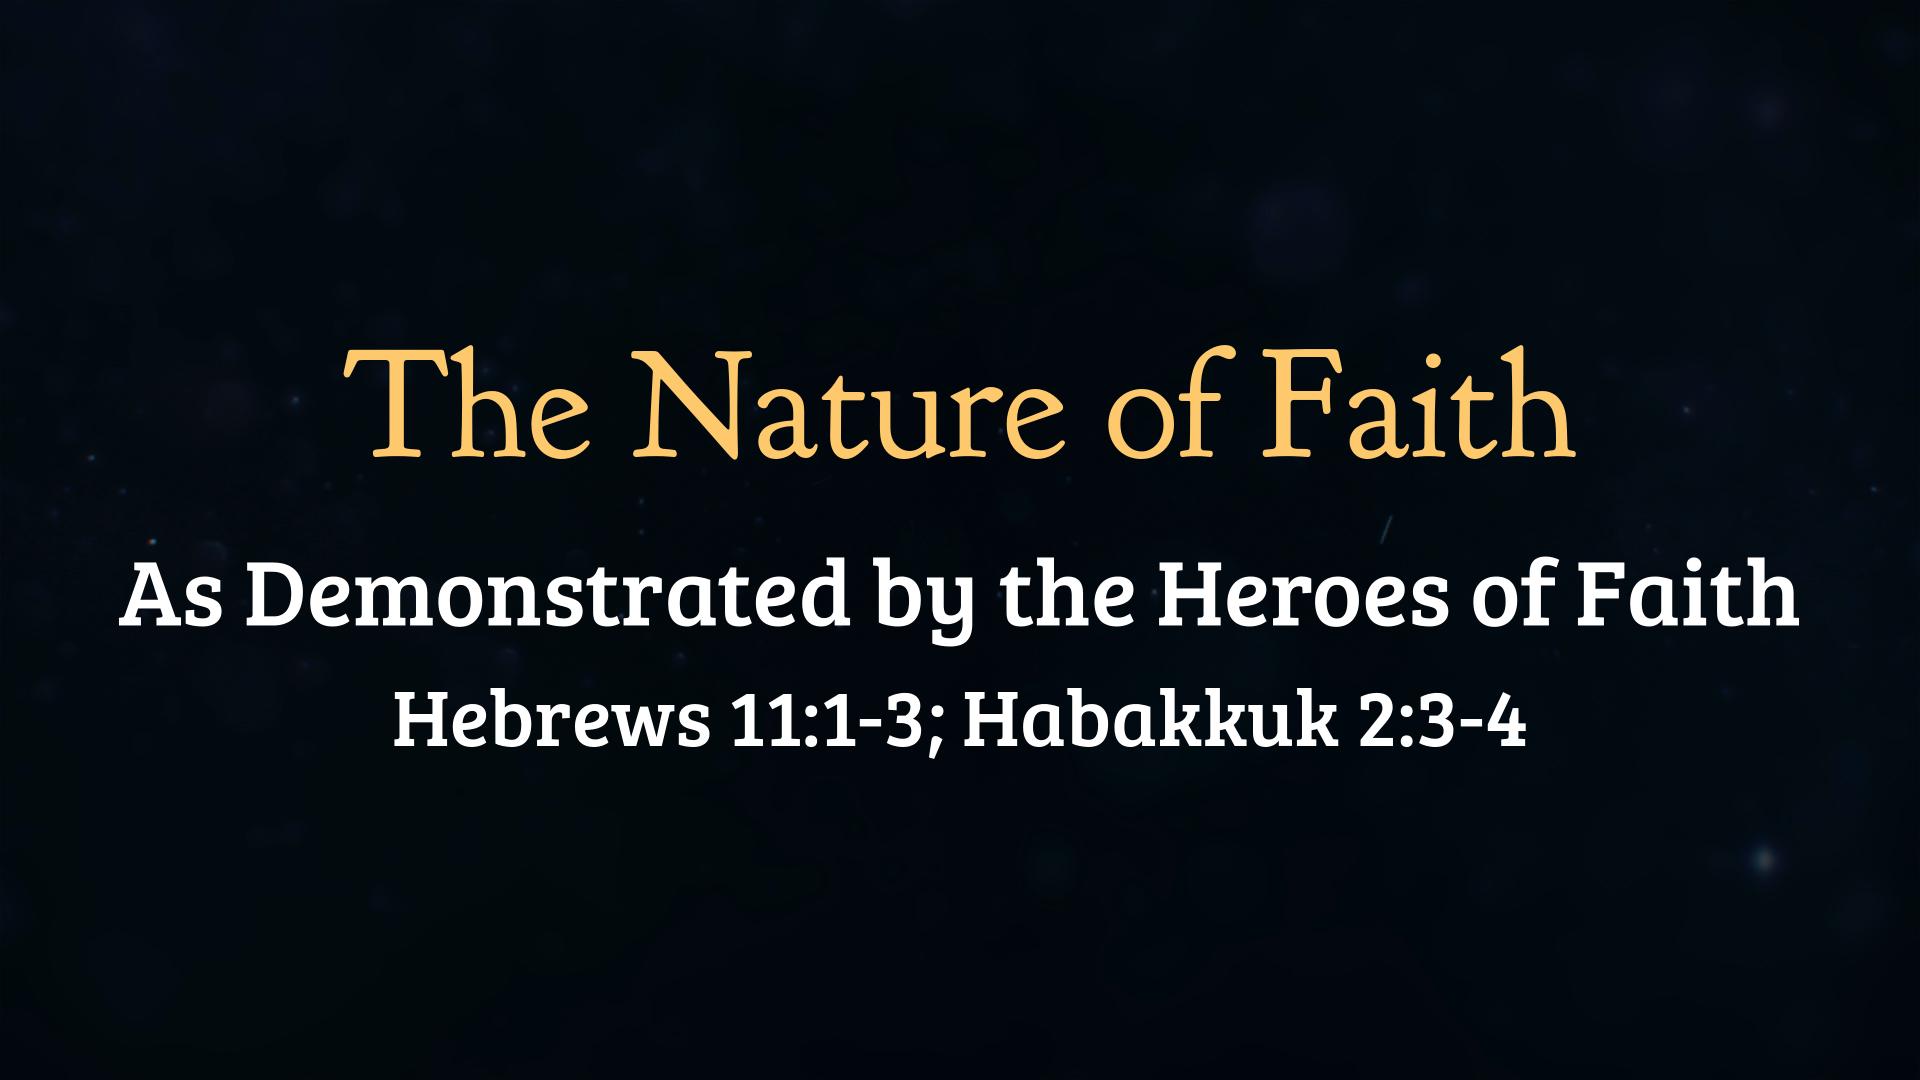 The Nature of Faith  Habakkuk 2:3-4; Hebrews 11:1-3